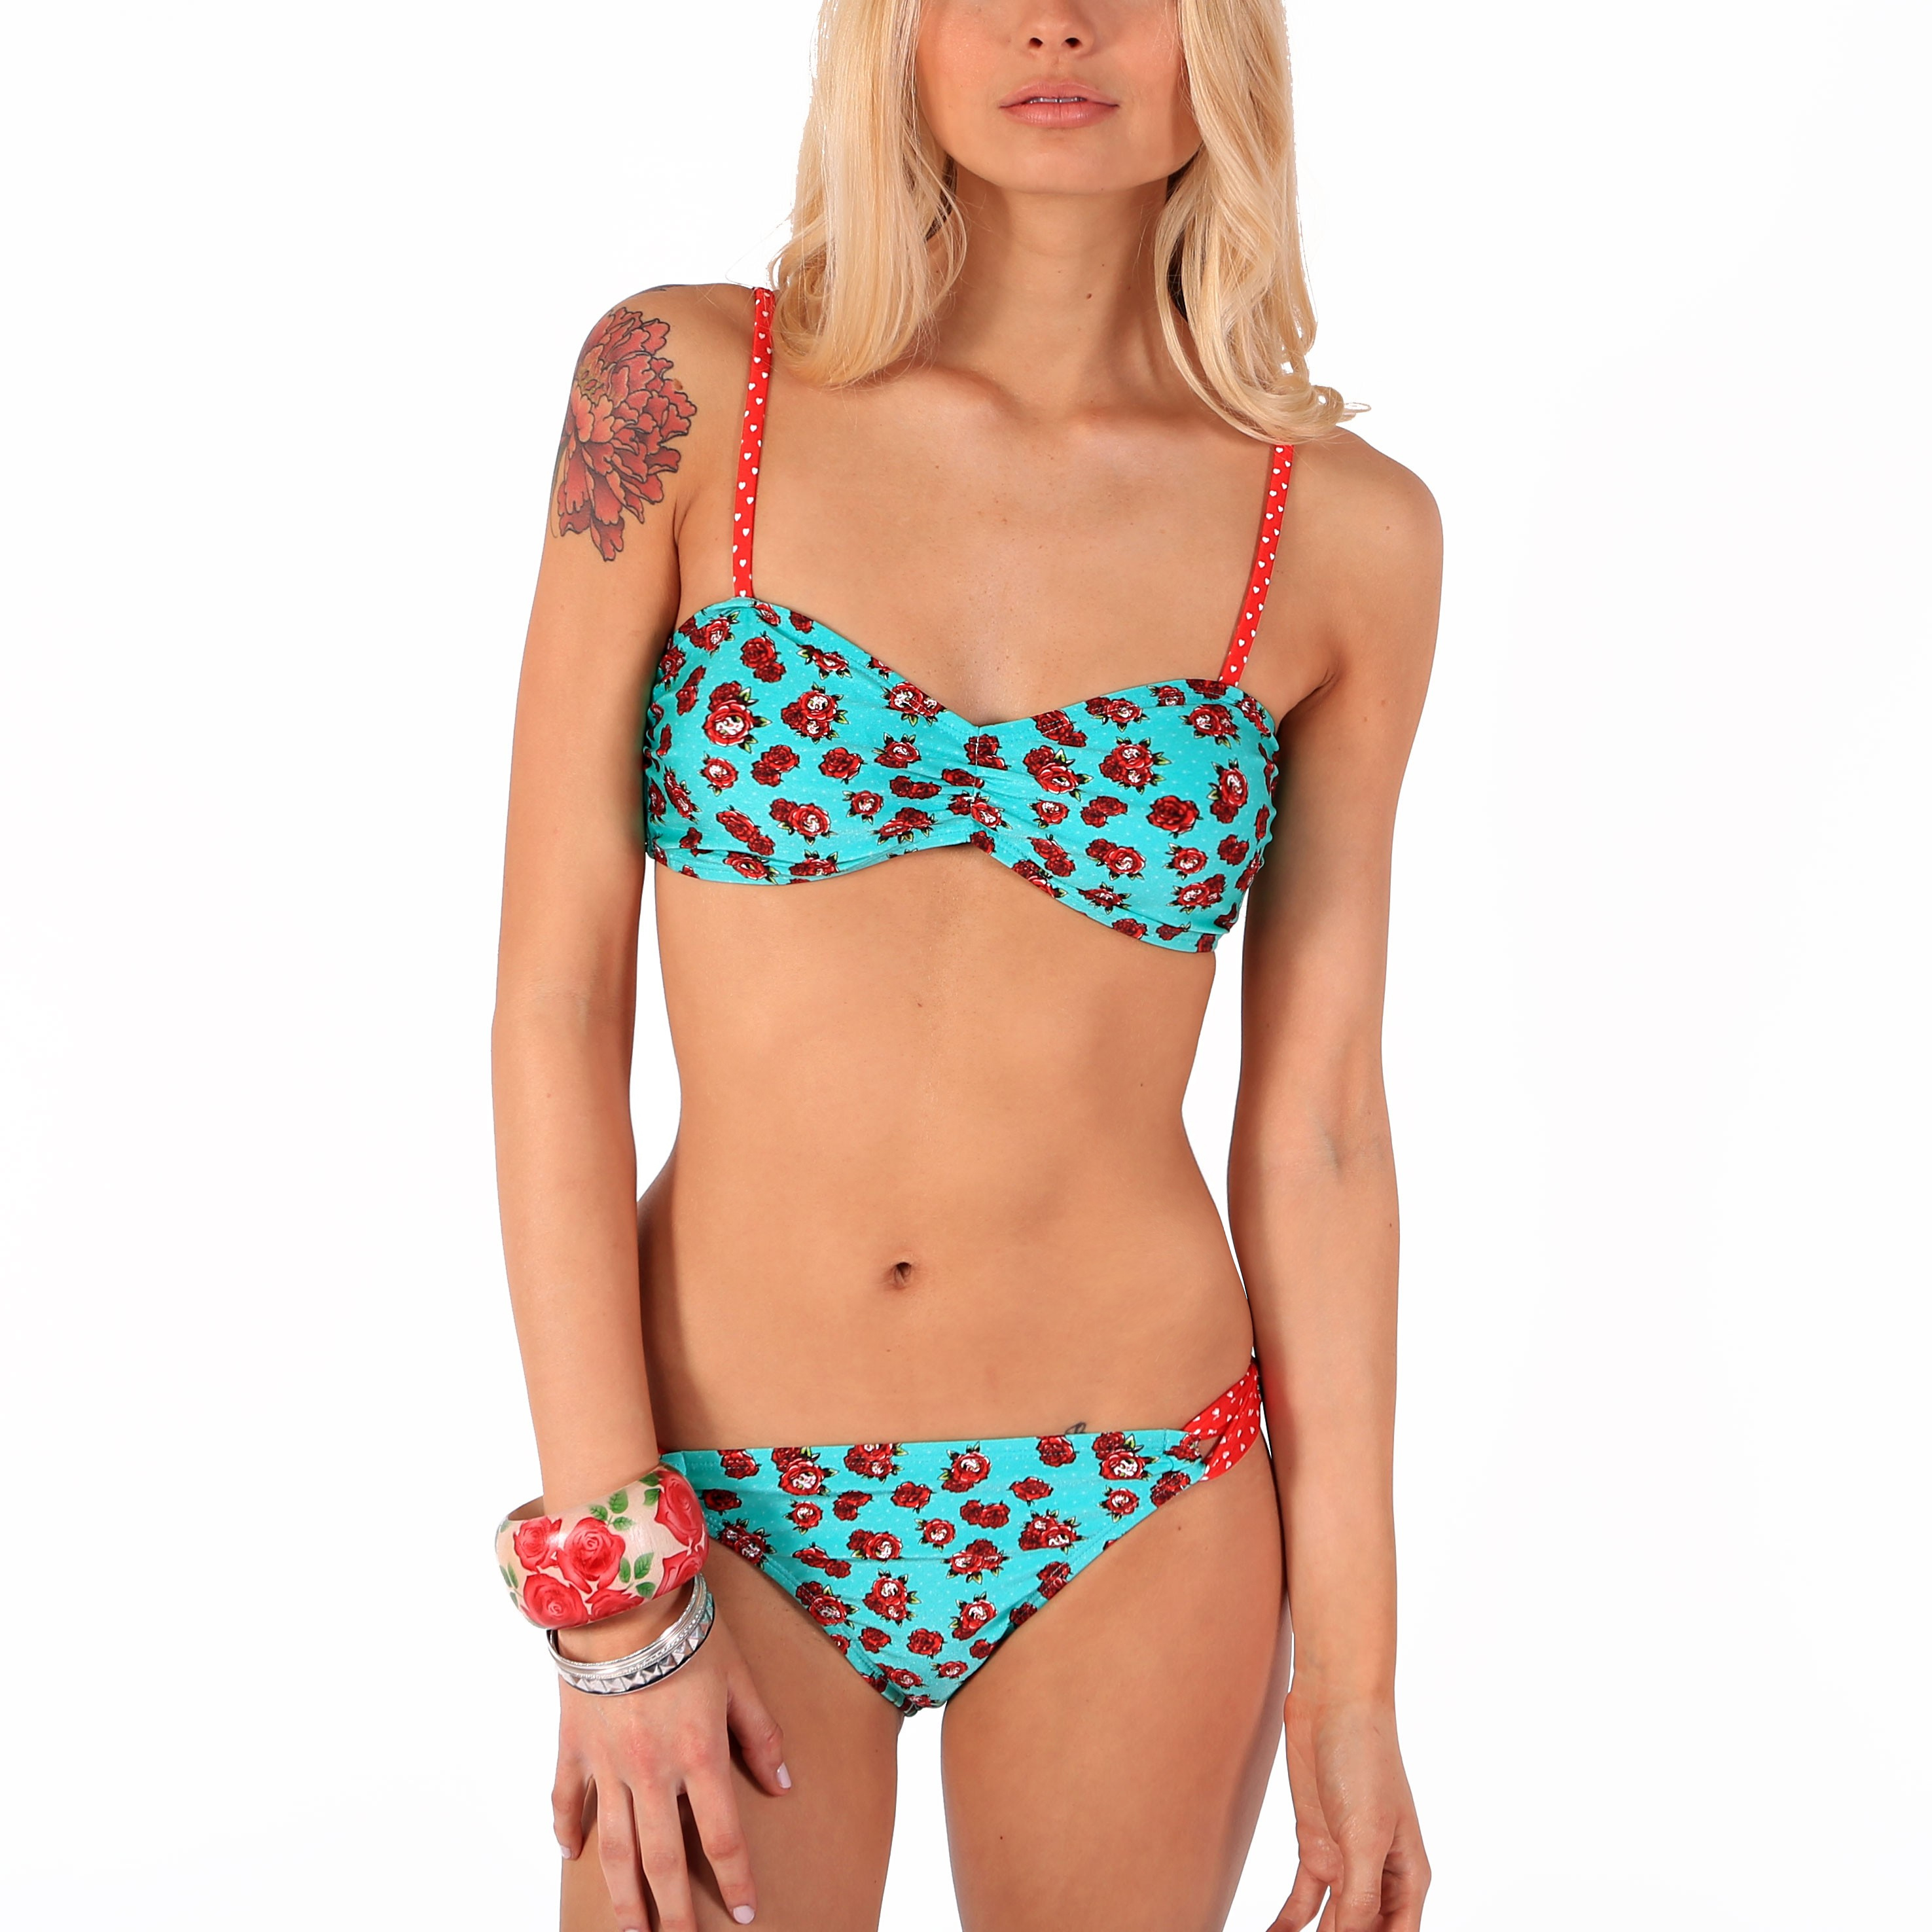 bikini iron fist floral bleu sexy maillot de bain plage ebay. Black Bedroom Furniture Sets. Home Design Ideas